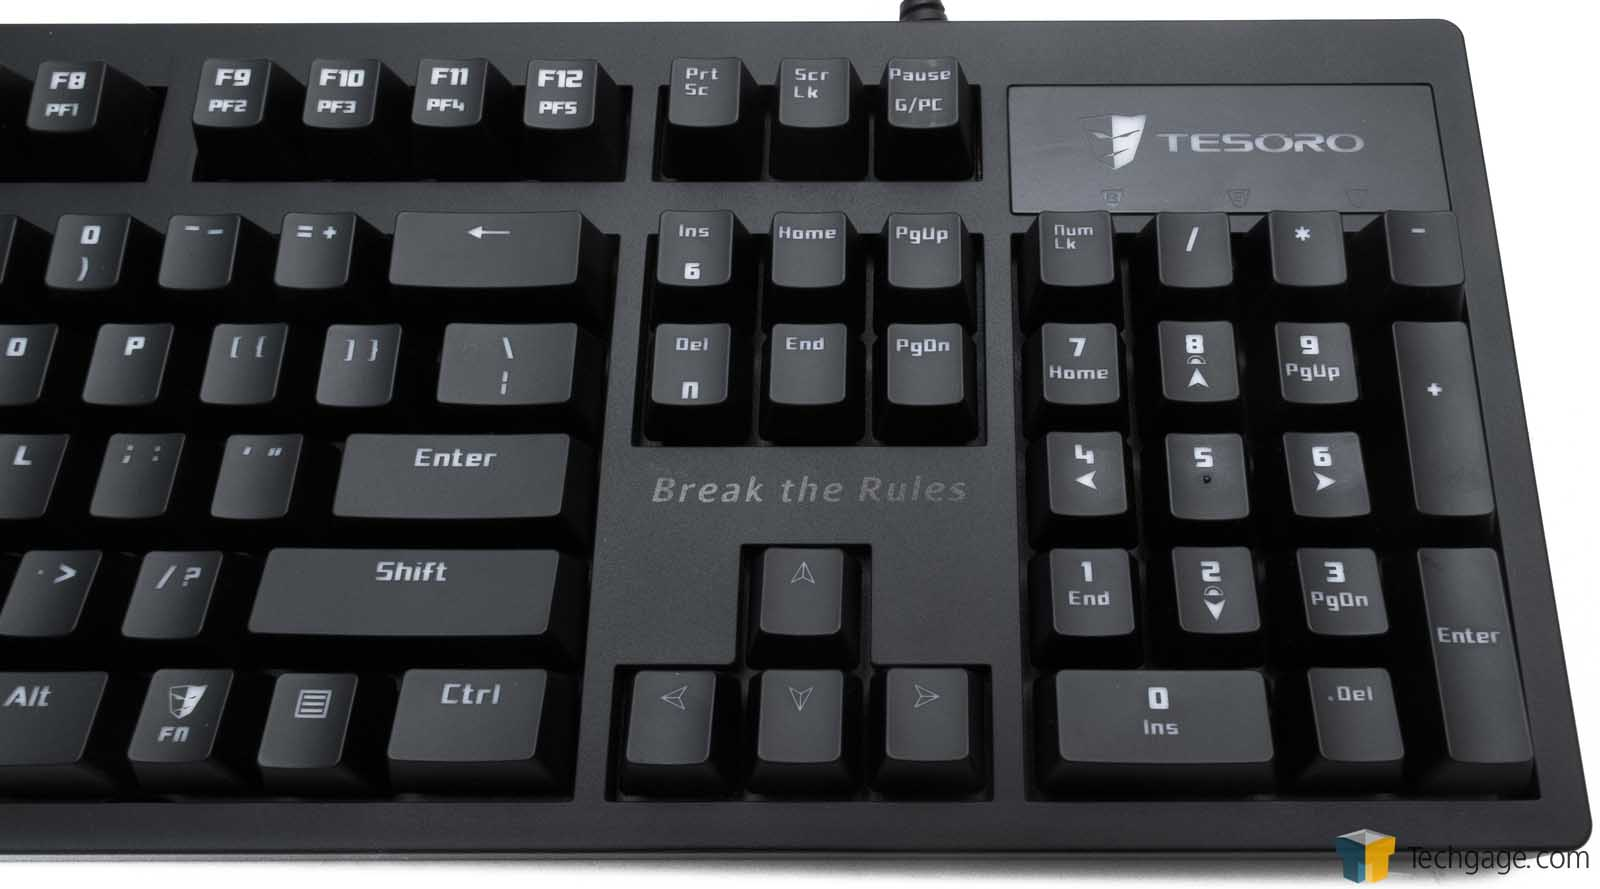 Tesoro Excalibur Illuminated Mechanical Gaming Keyboard